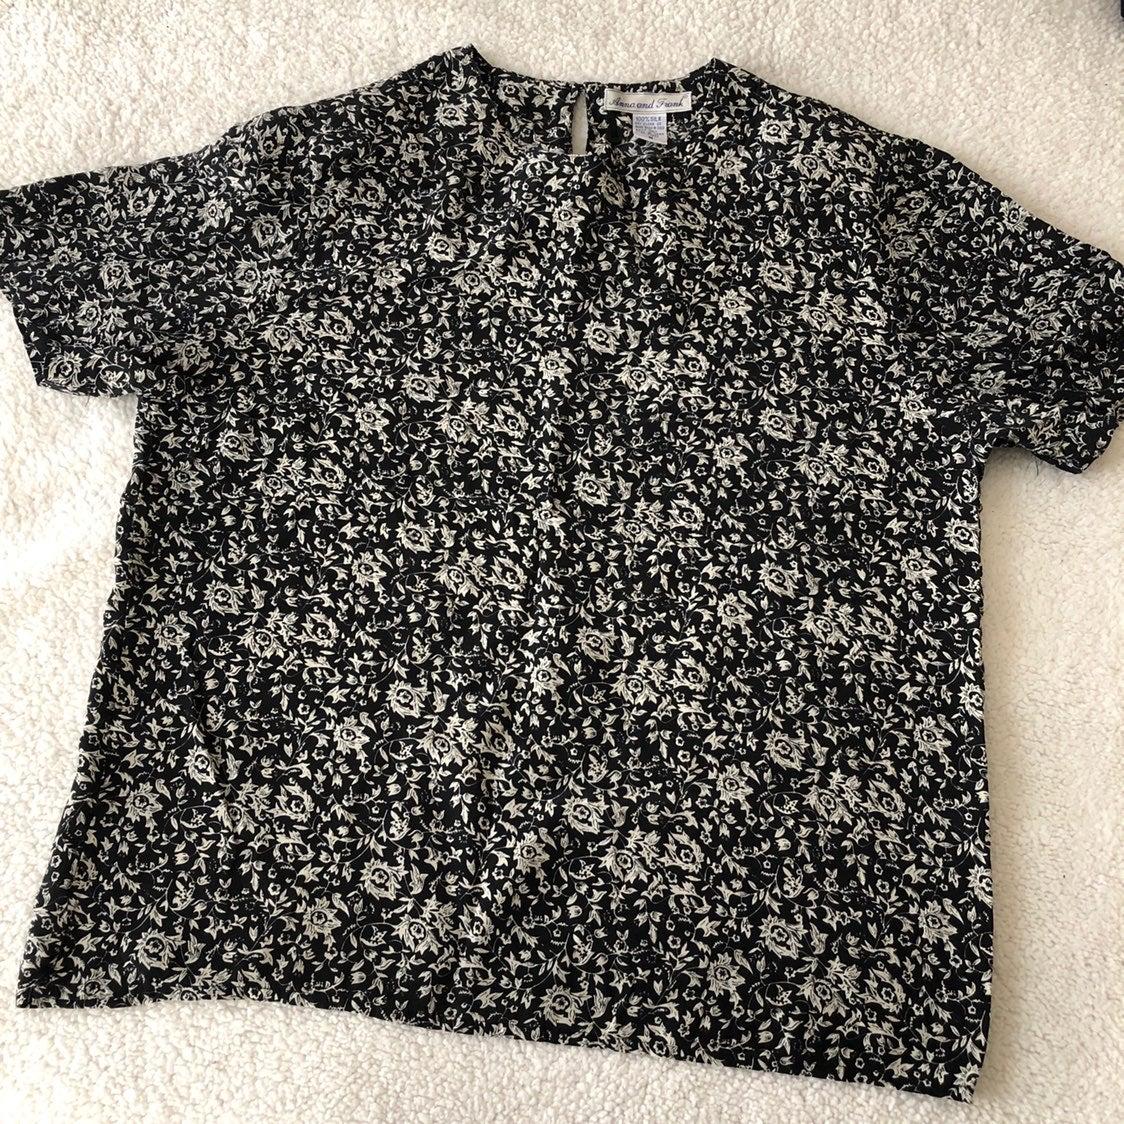 Vintage black white floral silk blouse M